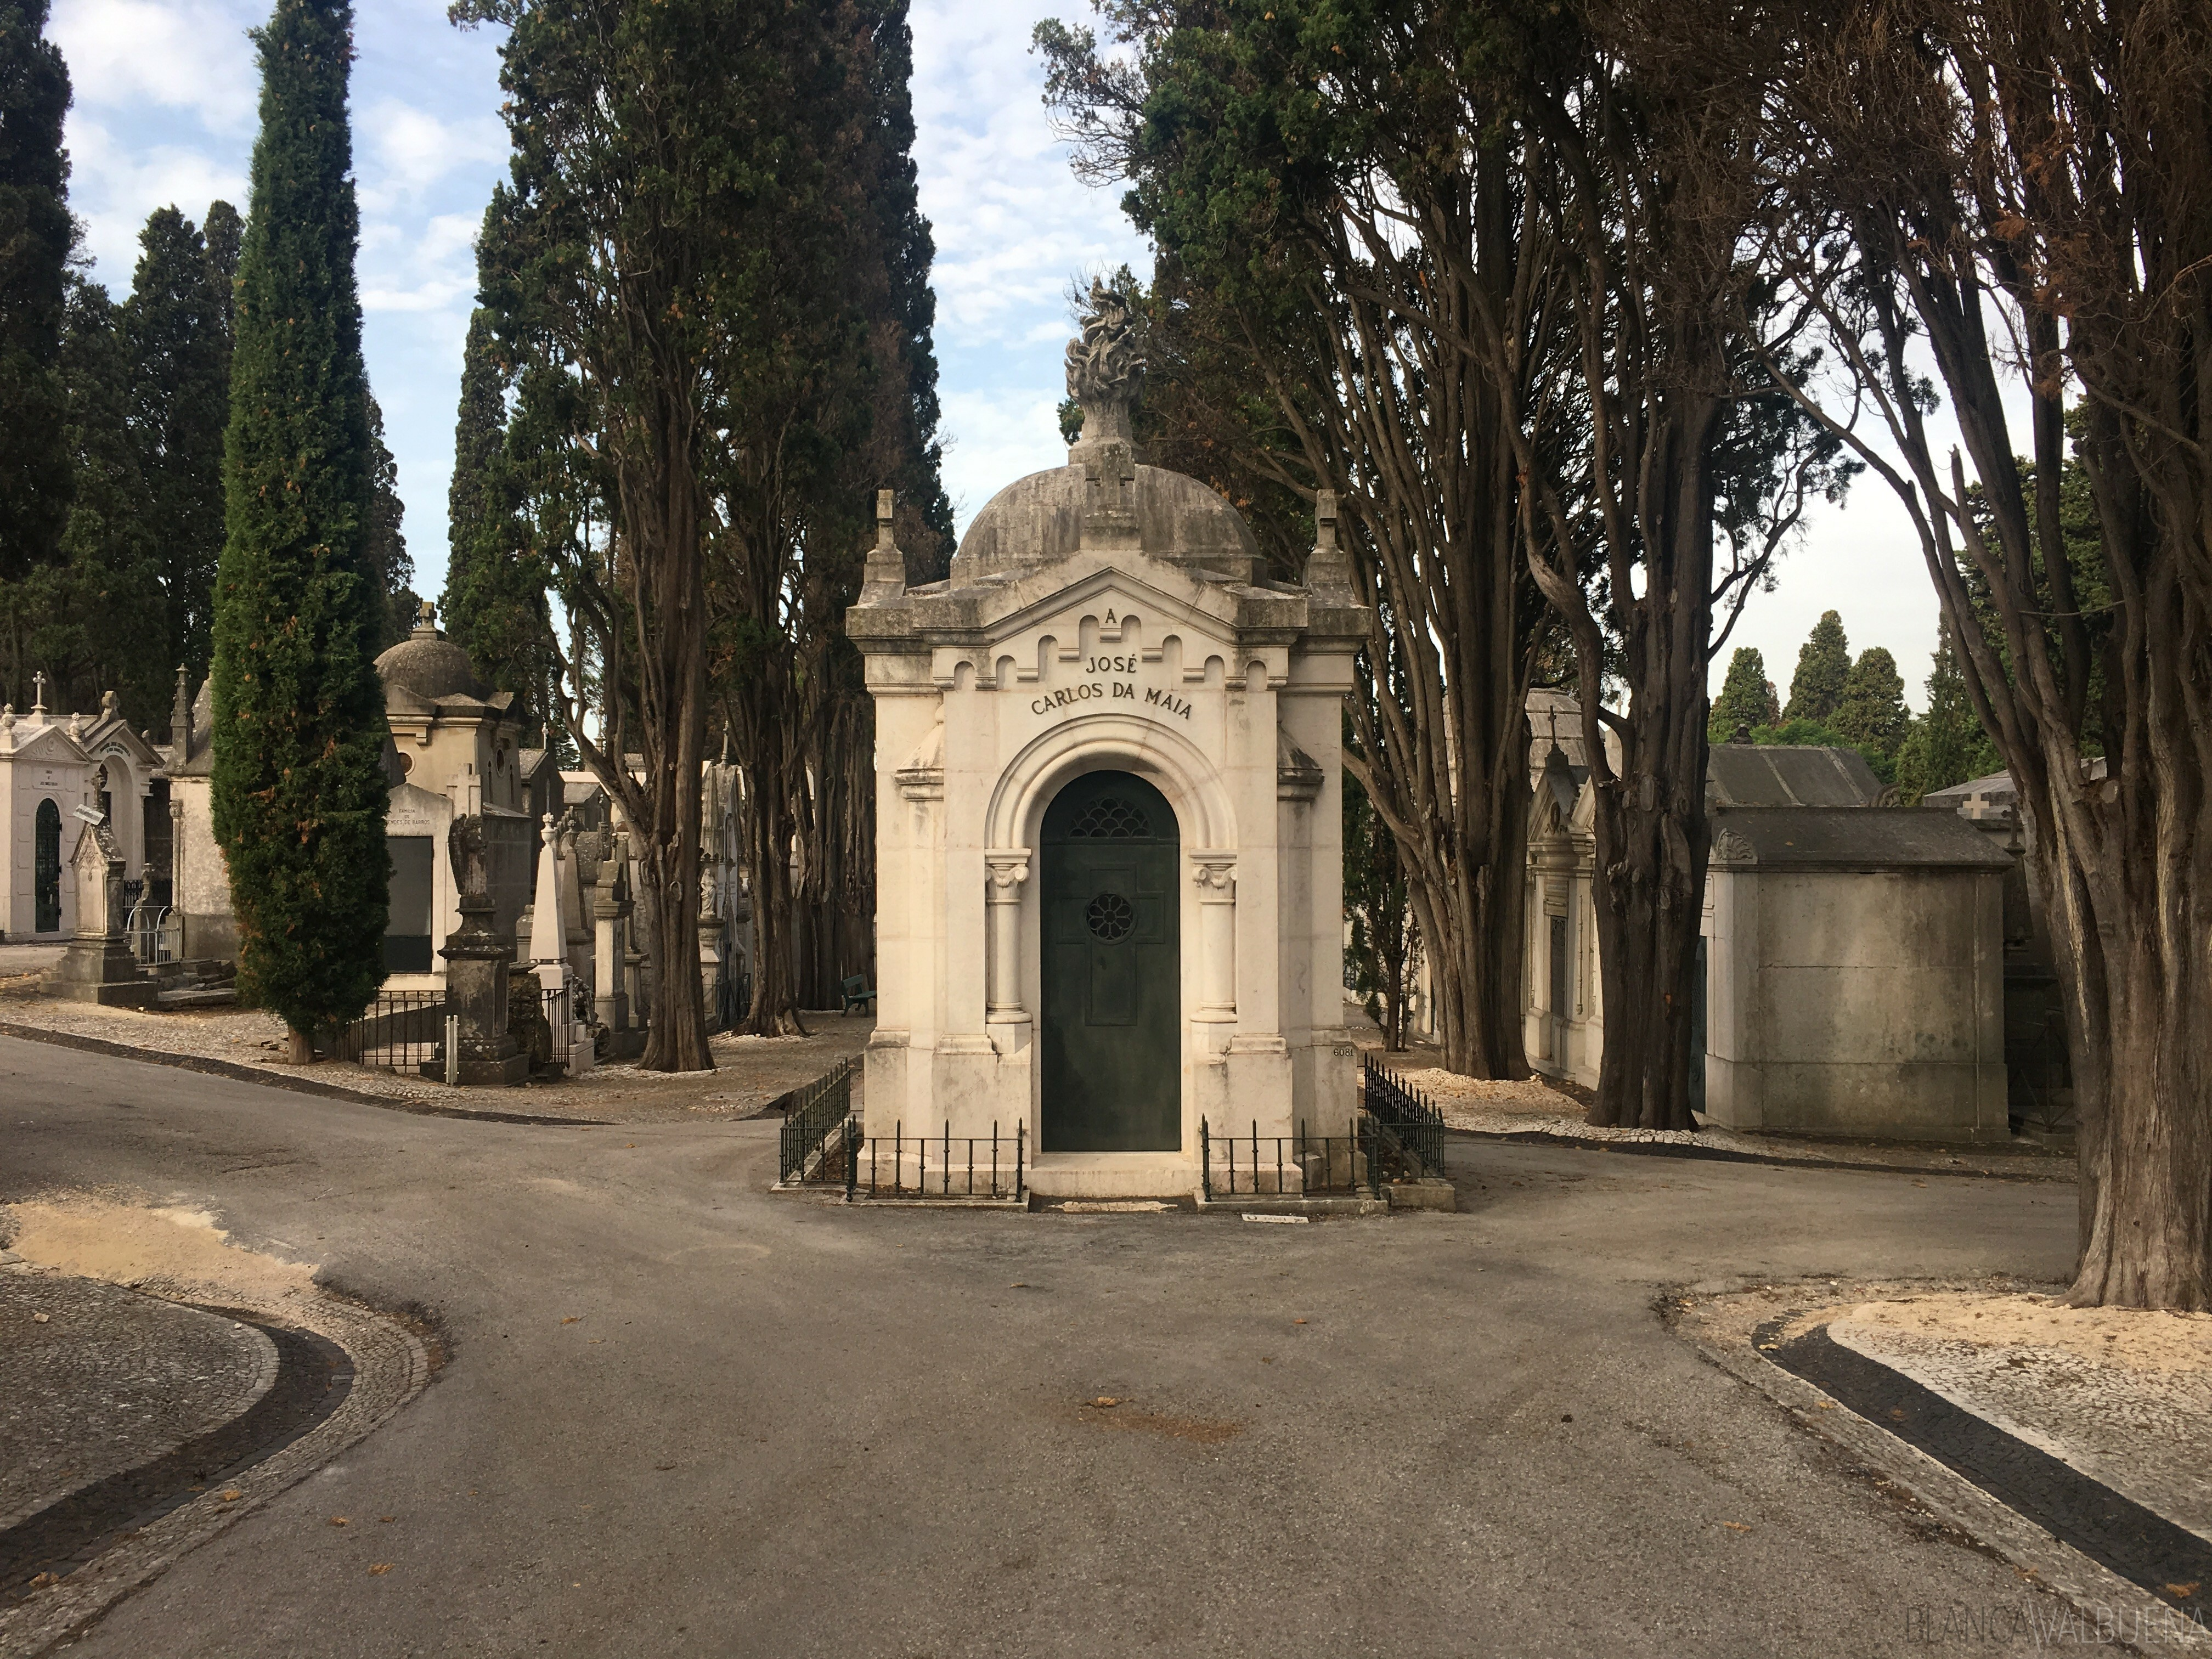 José Carlos da Maia ist auf dem Friedhof begraben Pleasures